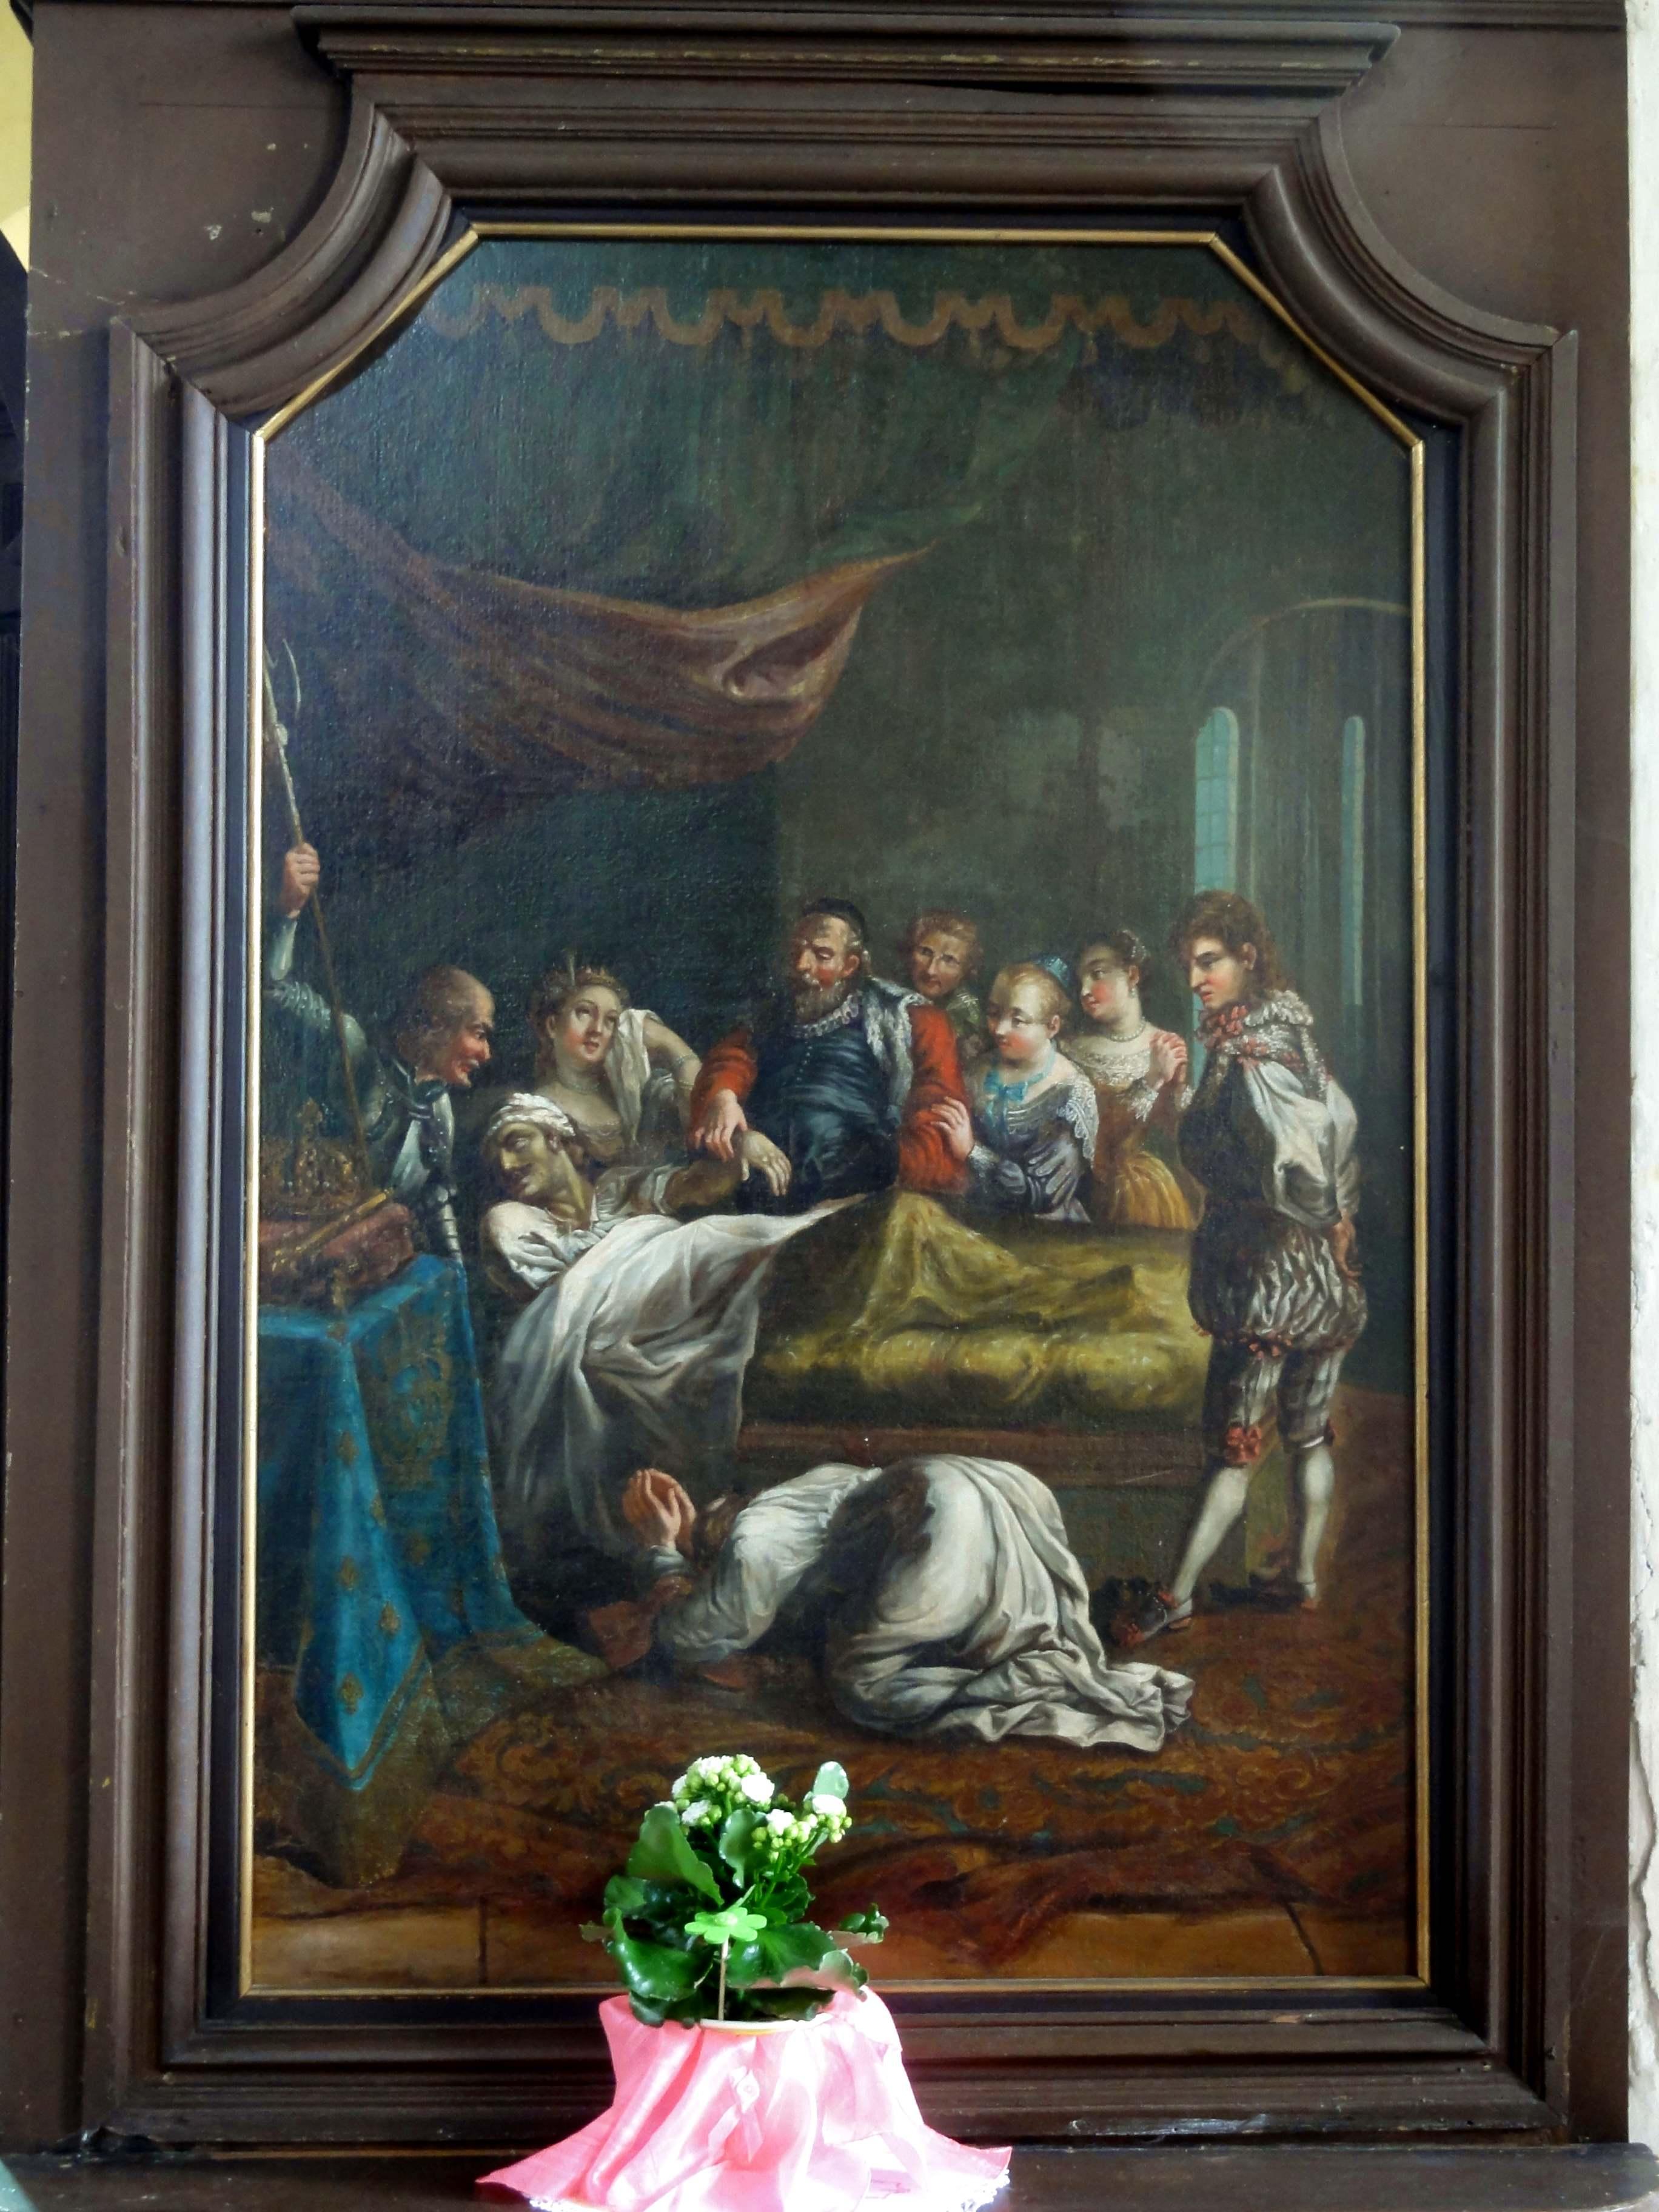 File Feigneux 60 Eglise Saint Martin Nef Tableau La Mort De Charles Ix Jpg Wikimedia Commons